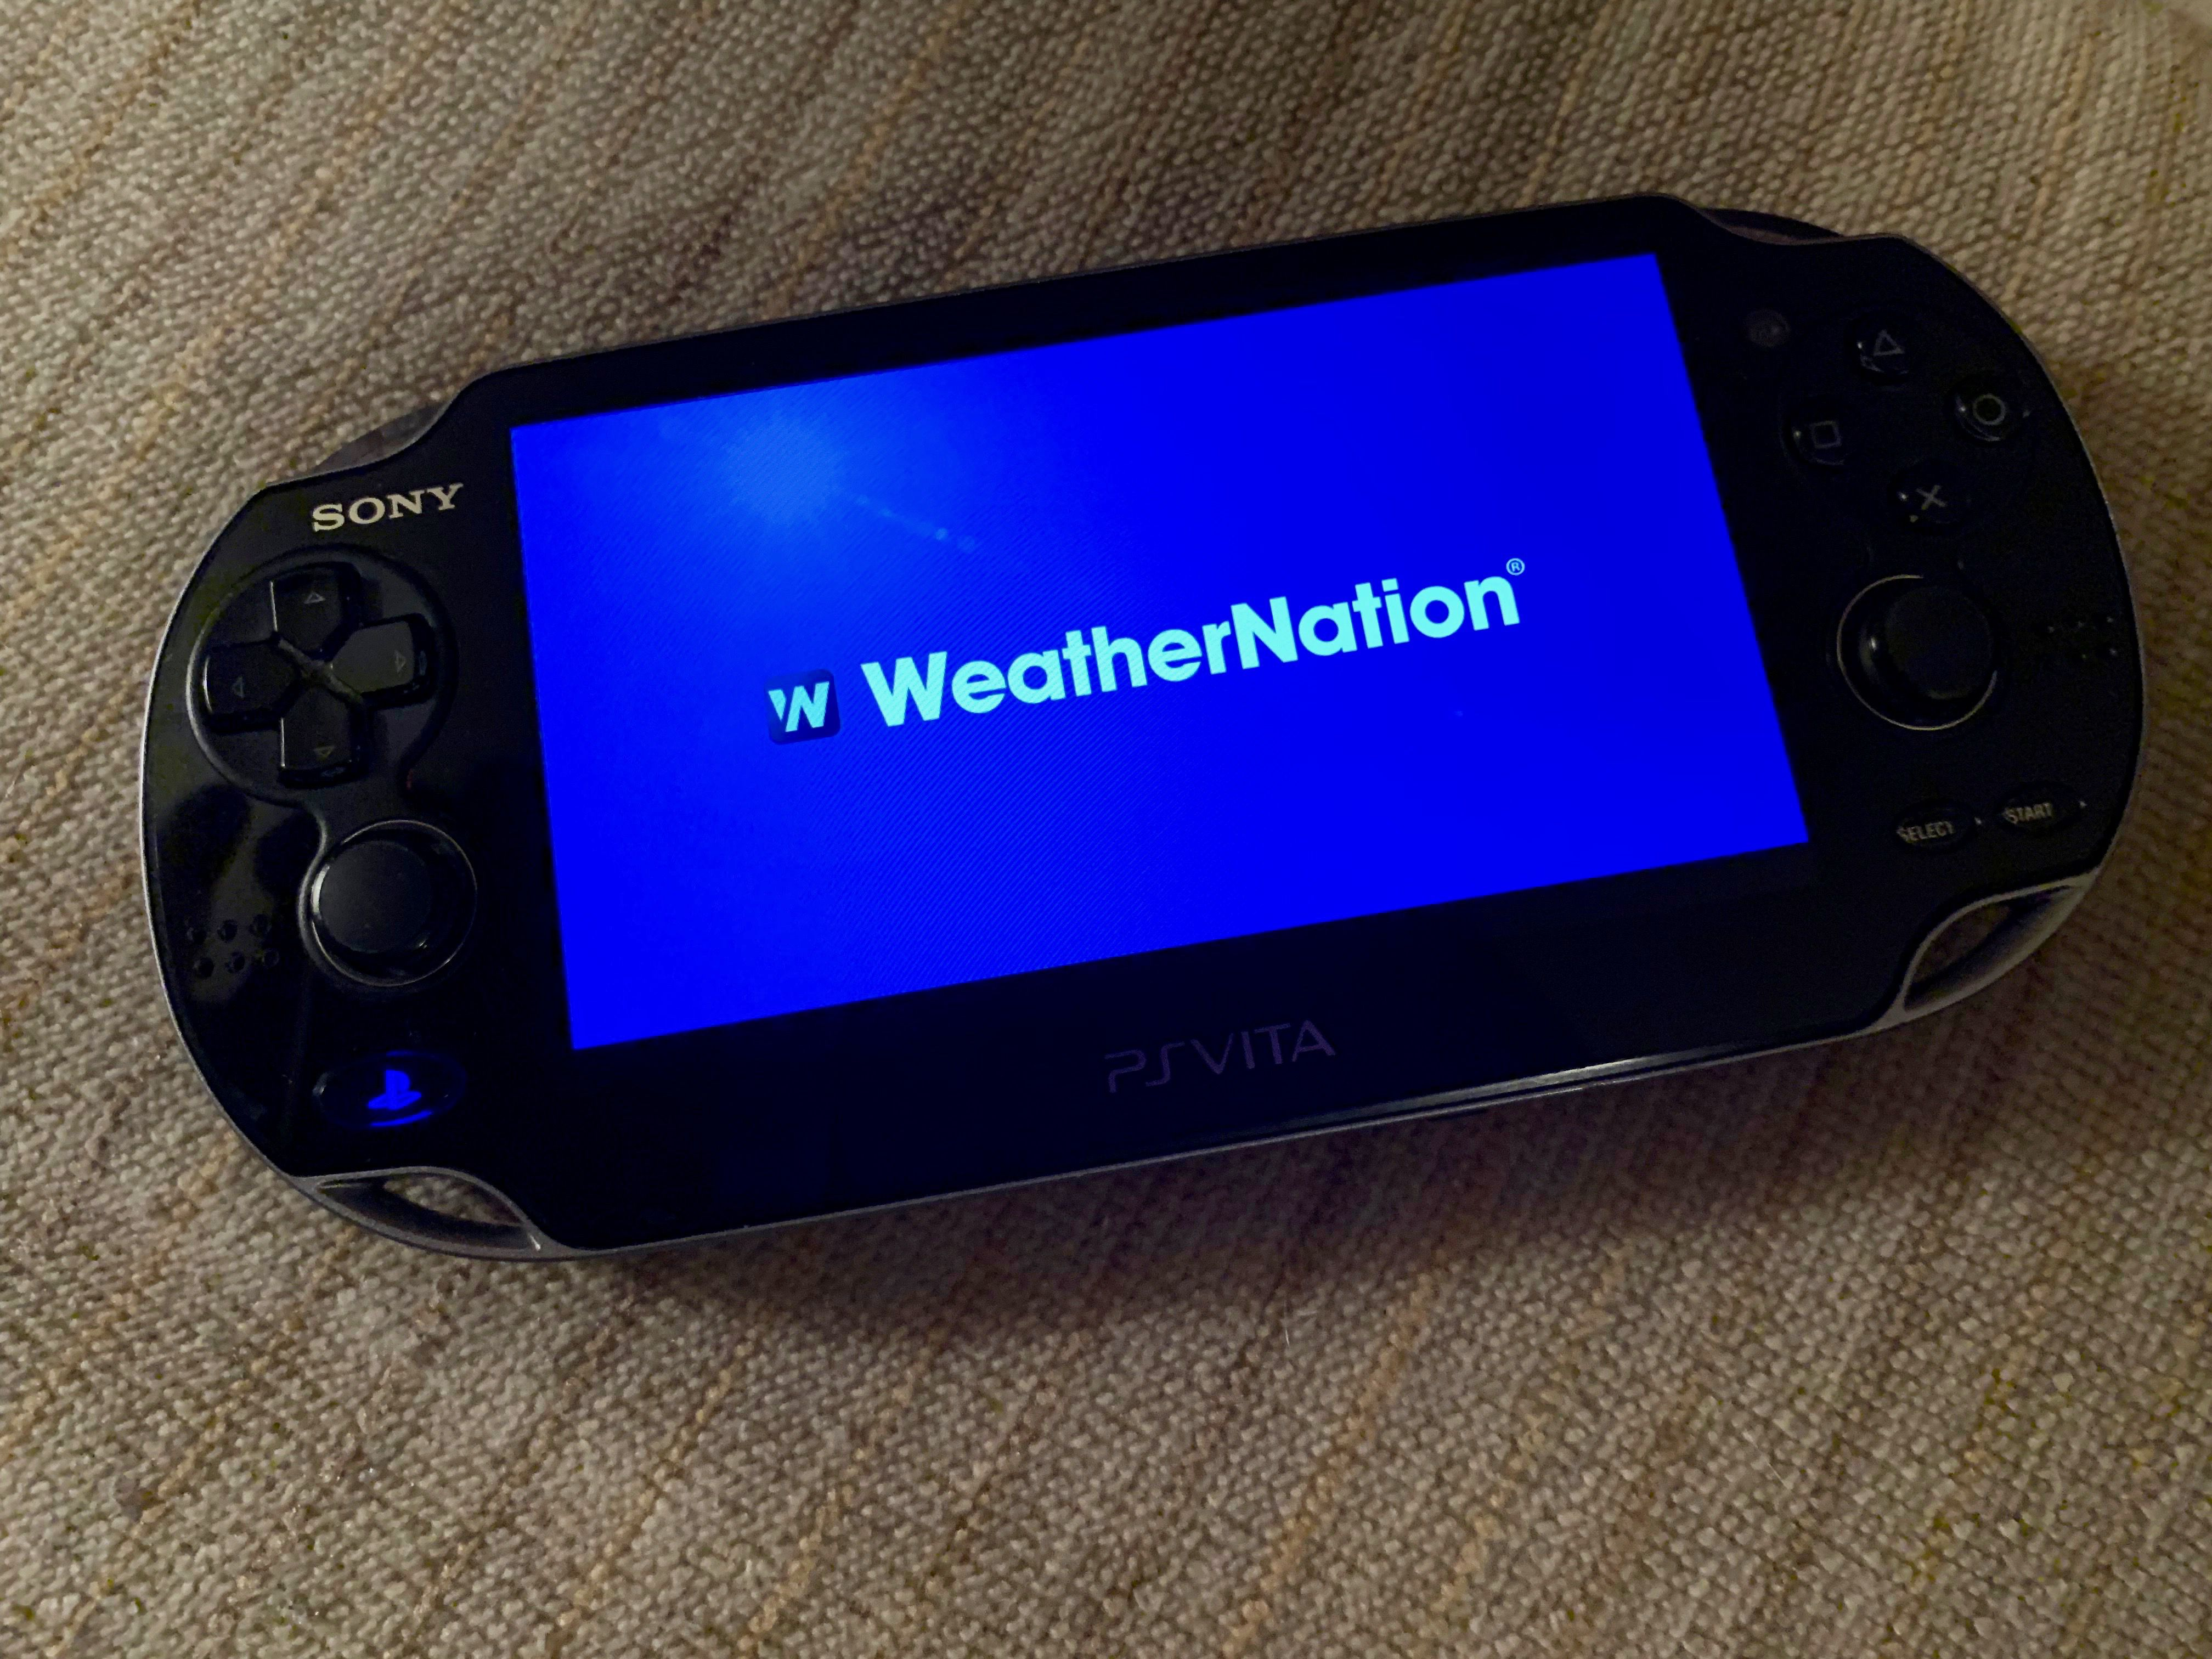 WeatherNation app on PS Vita